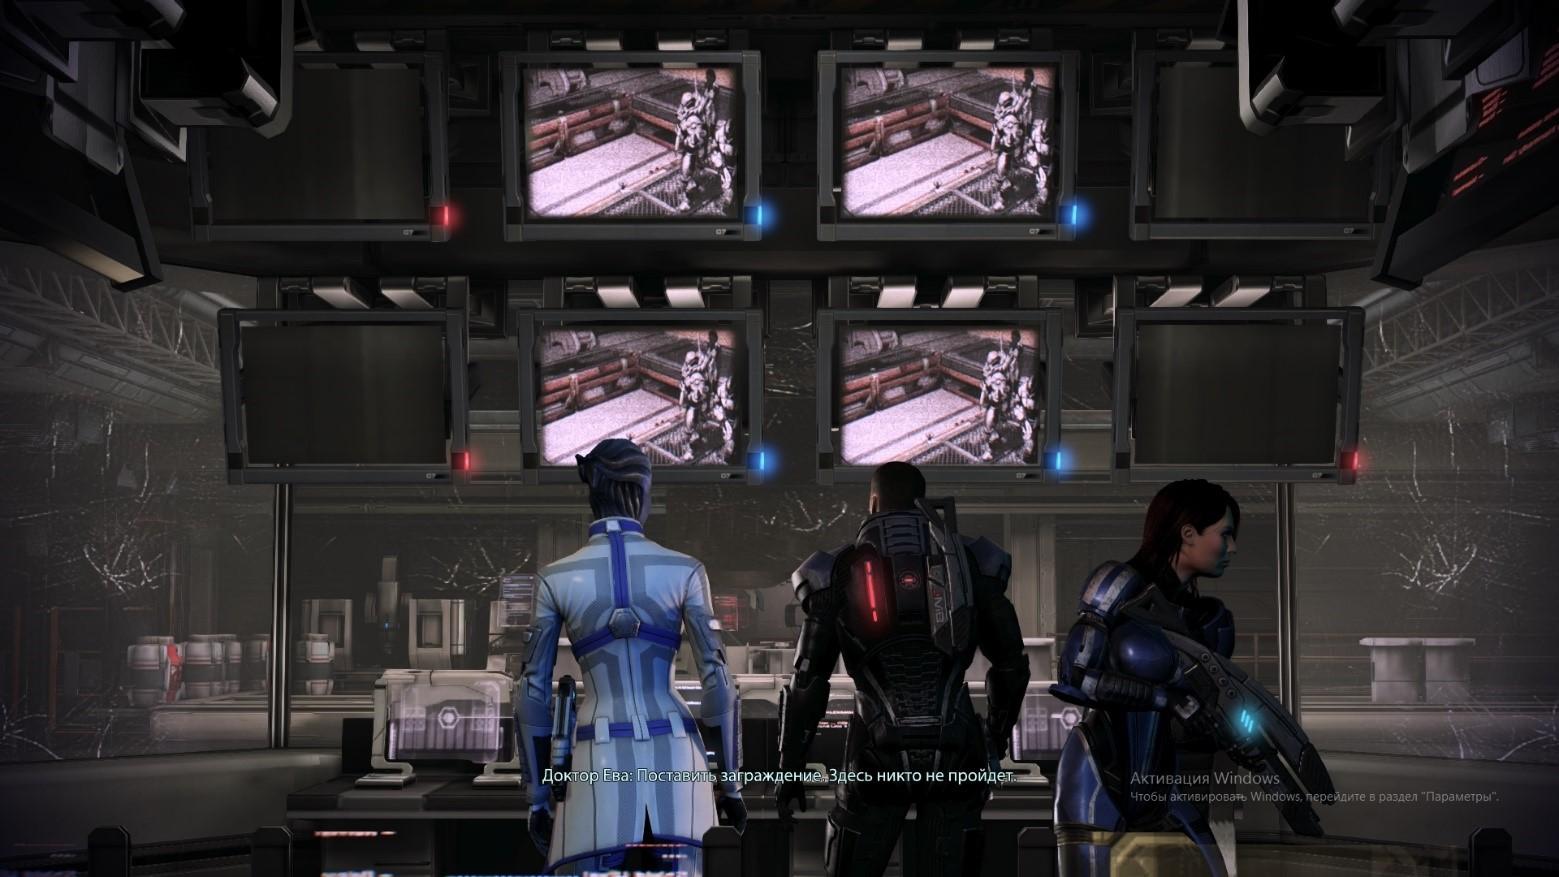 Рис. 2 - Mass Effect 3